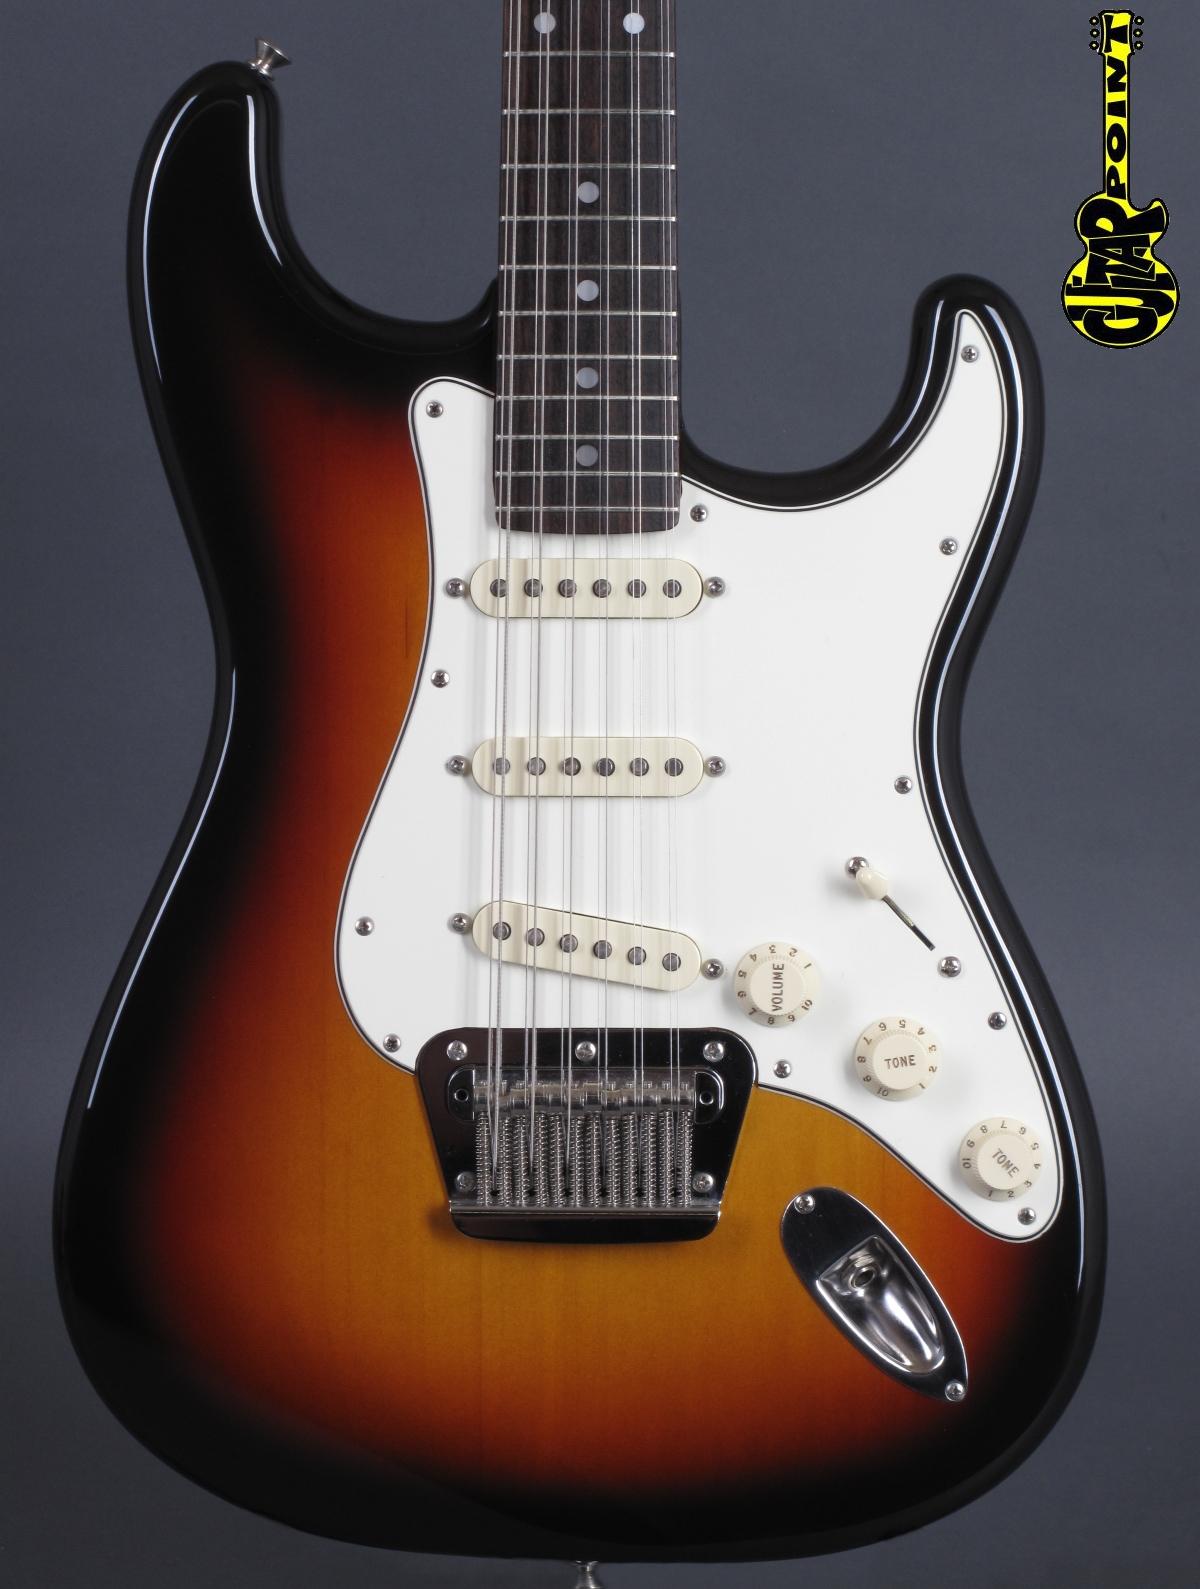 1994 Fender Stratocaster XII 3-tone Sunburst /12-String!